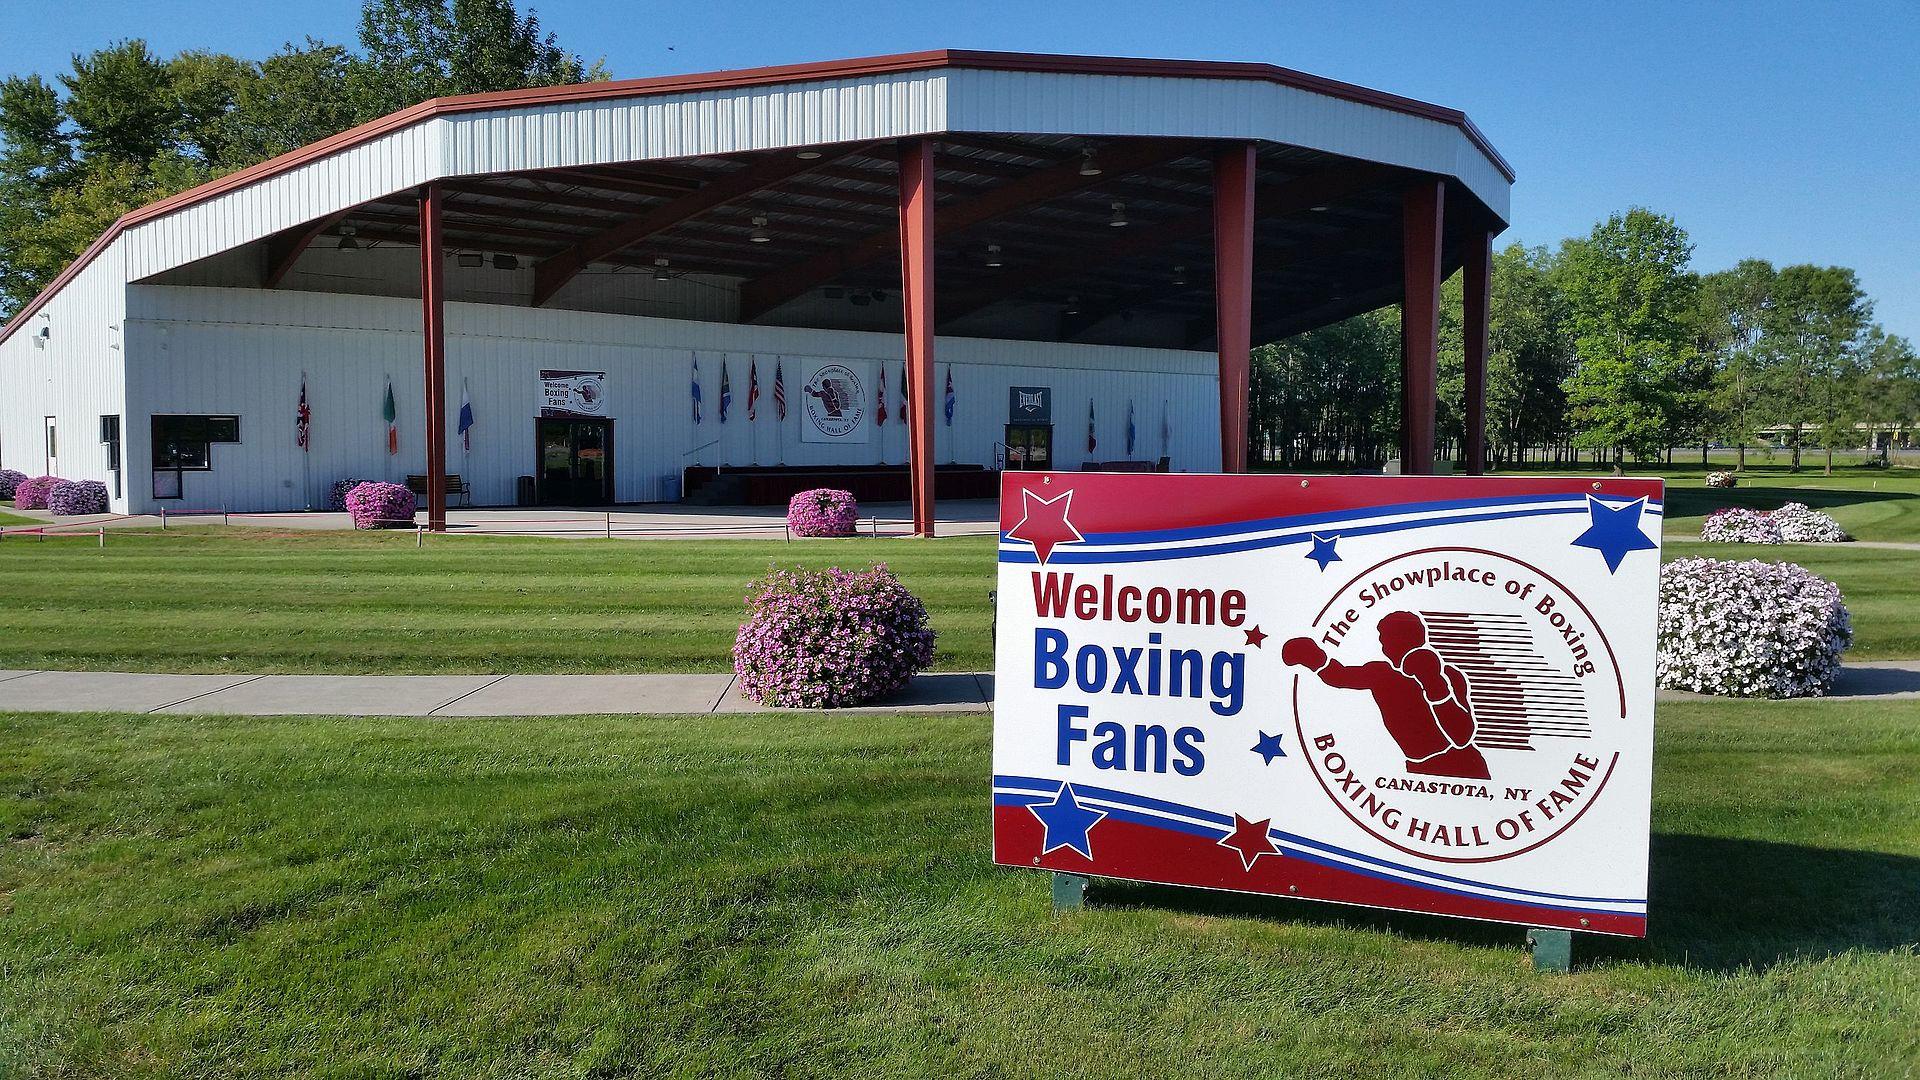 international boxing hall of fame wikipedia. Black Bedroom Furniture Sets. Home Design Ideas